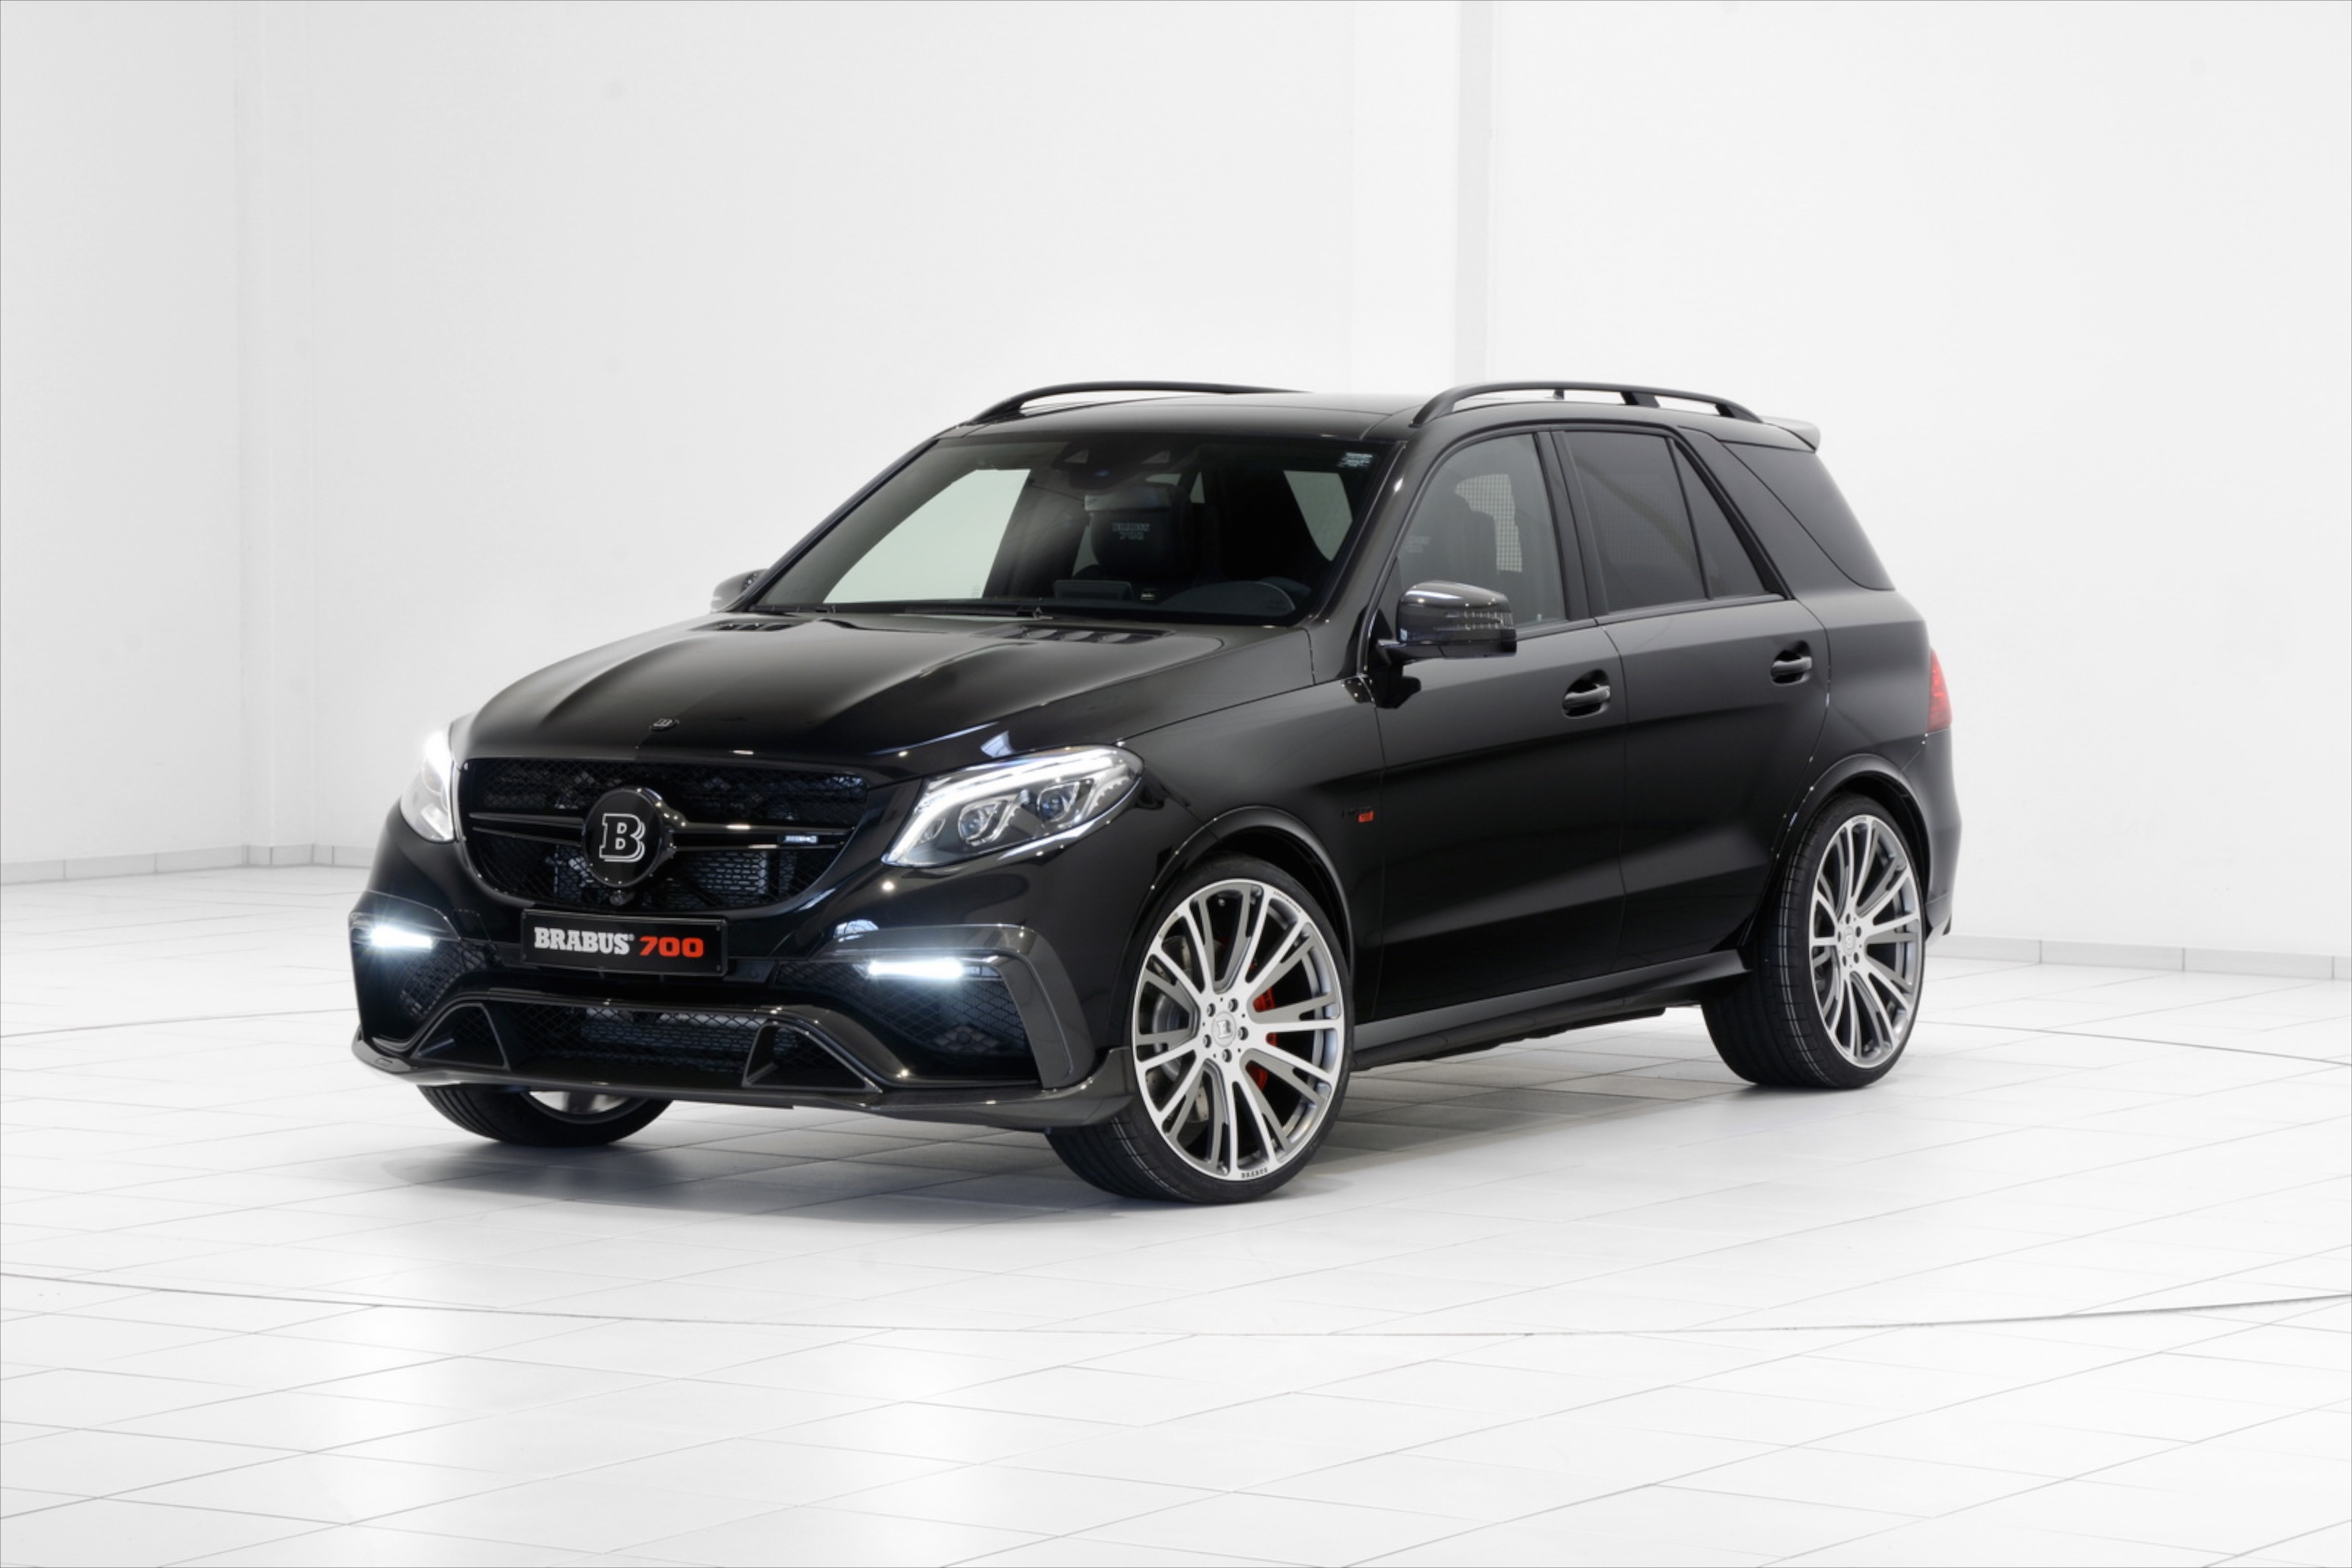 Brabus Gle 700 Mercedes Amg Gle 63 With 700 Ps Image 458267